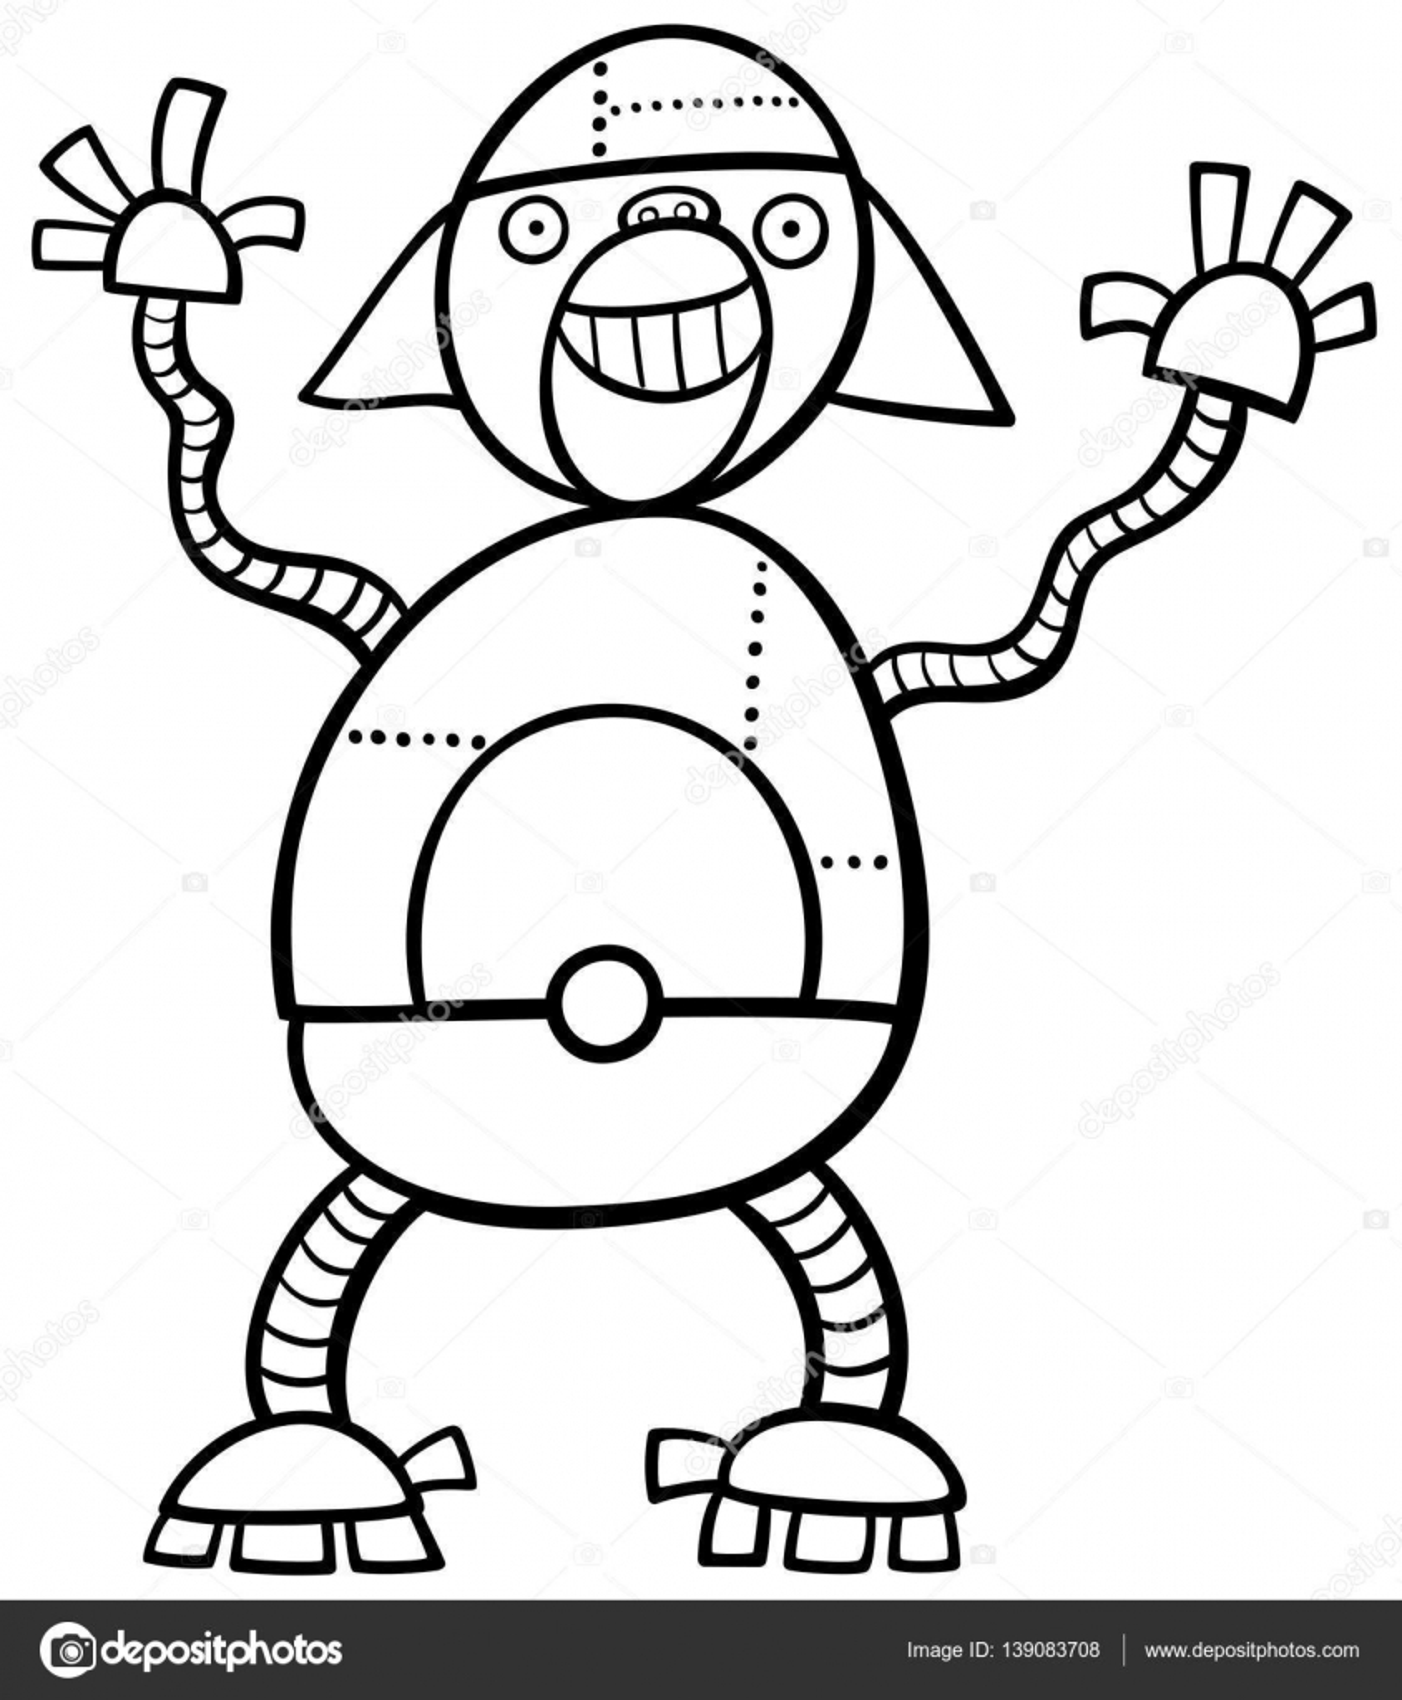 Affe Roboter Ausmalbilder — Stockvektor © izakowski #139083708